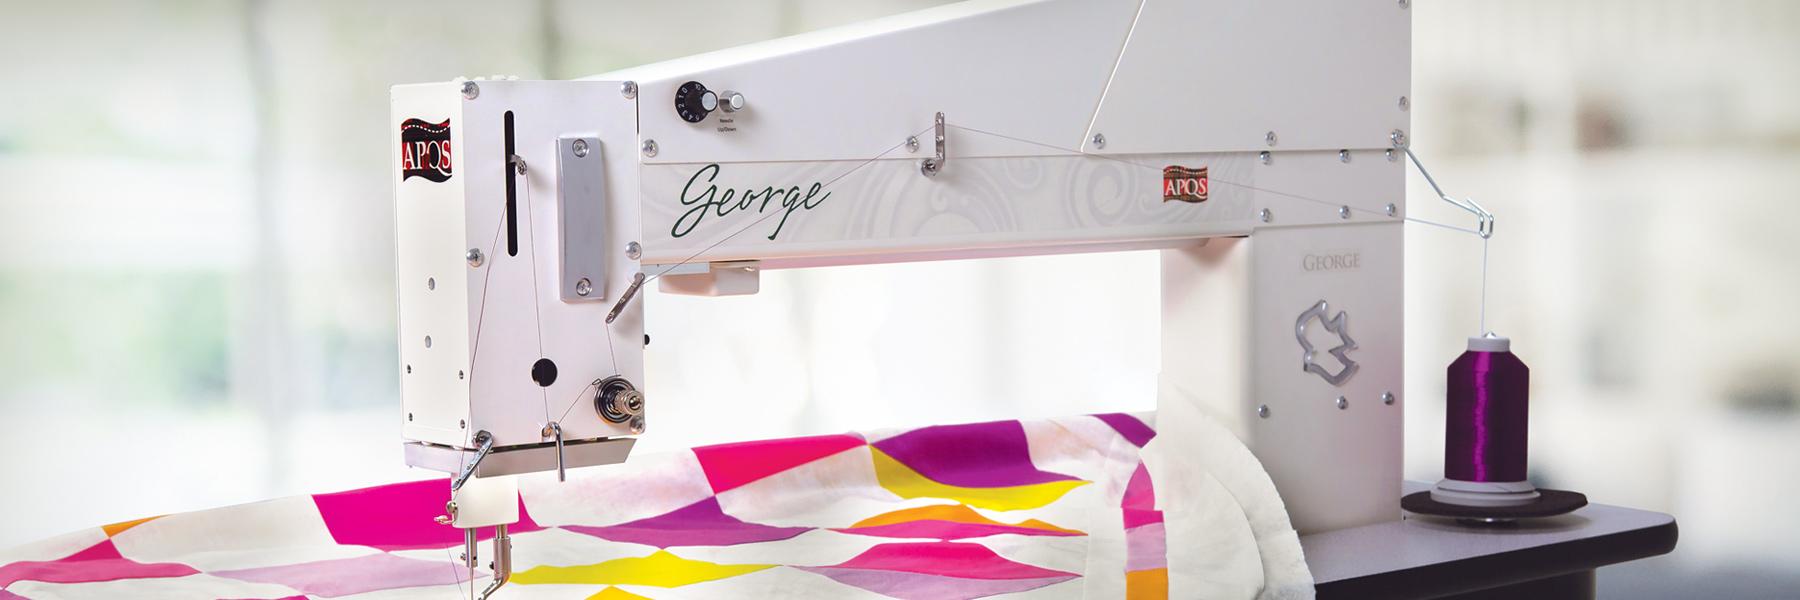 George Quilting Machine - Hero Image